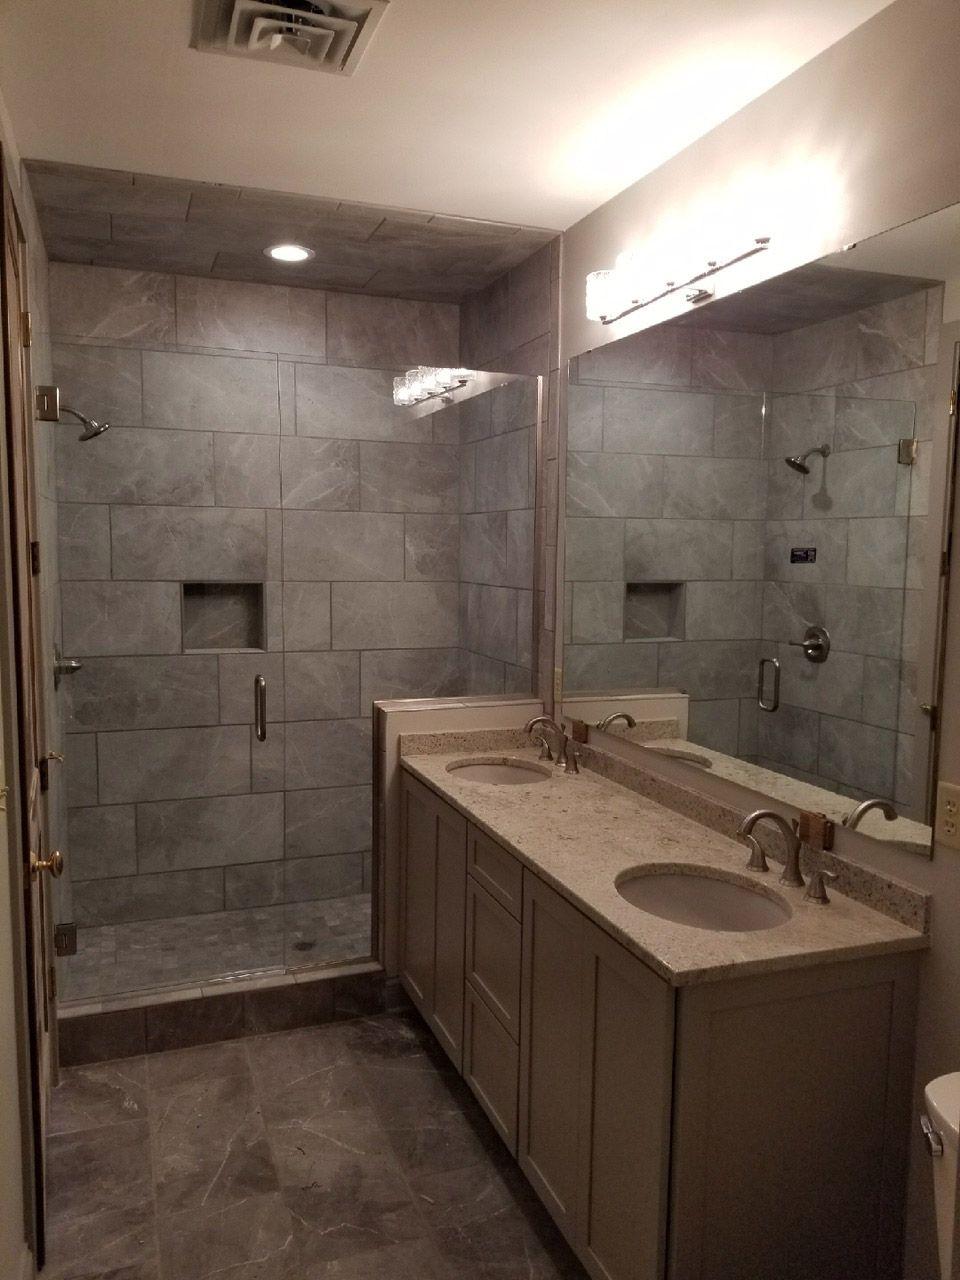 Modern bathroom design complete with custom glass